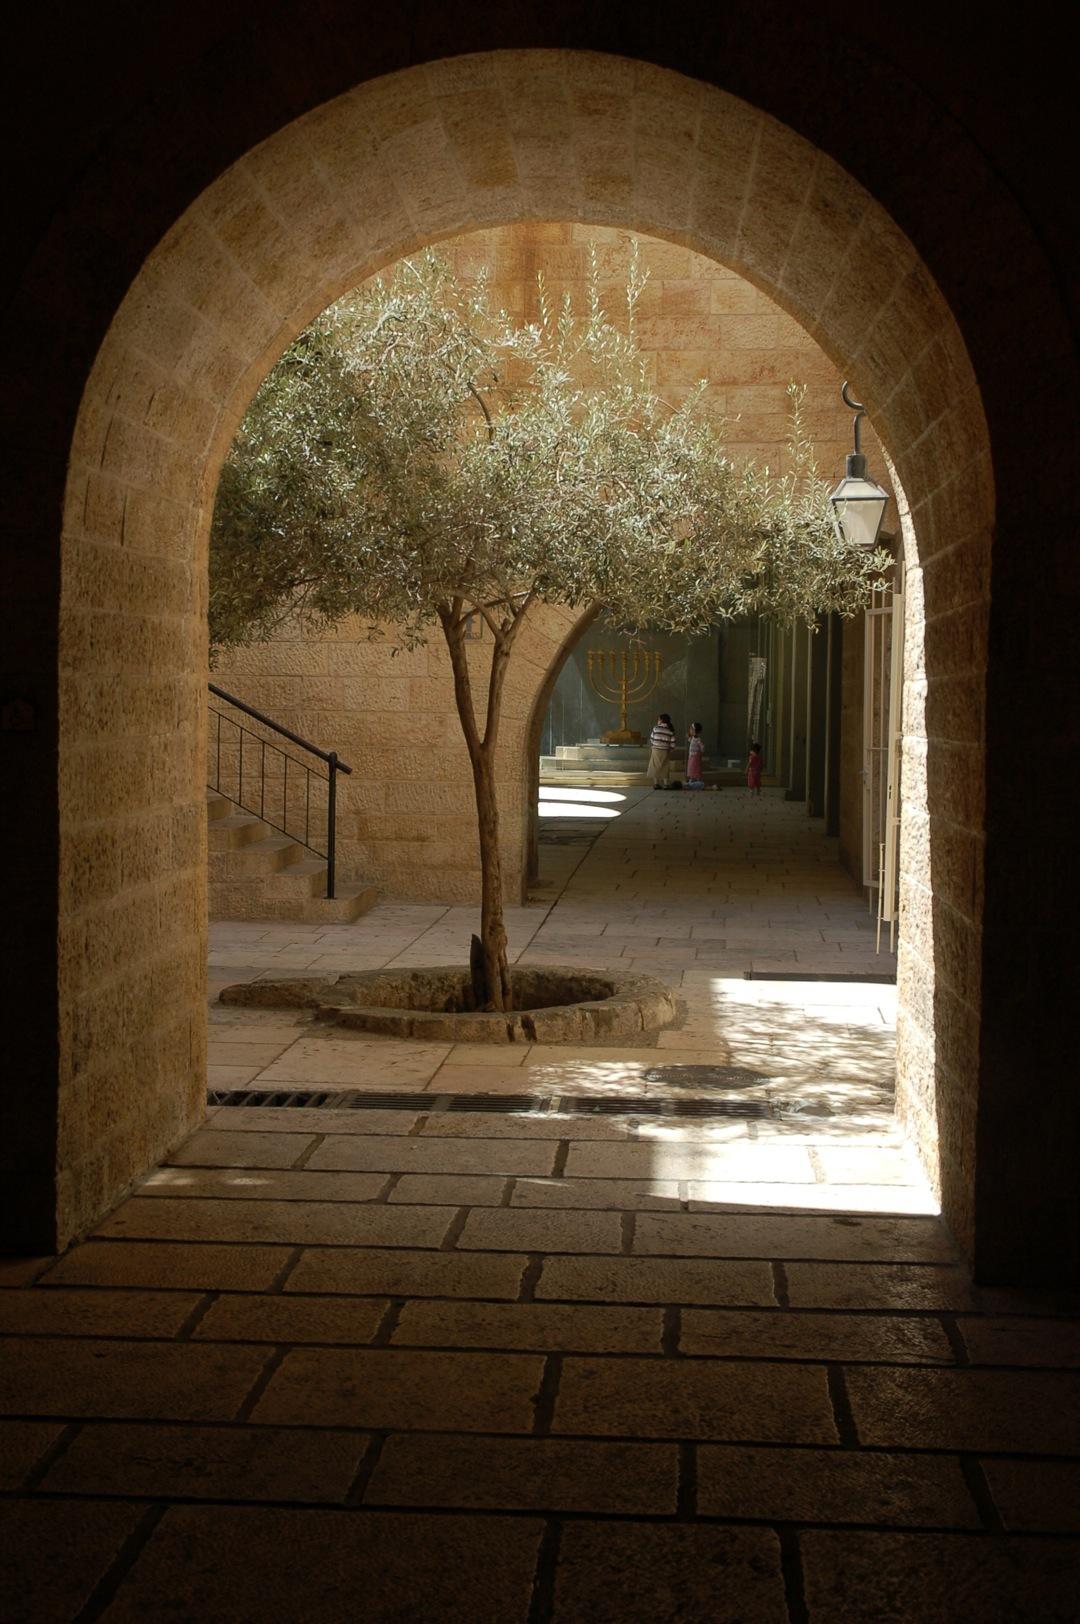 7. Rincón con olivo en Jerusalén. Autor, David55King